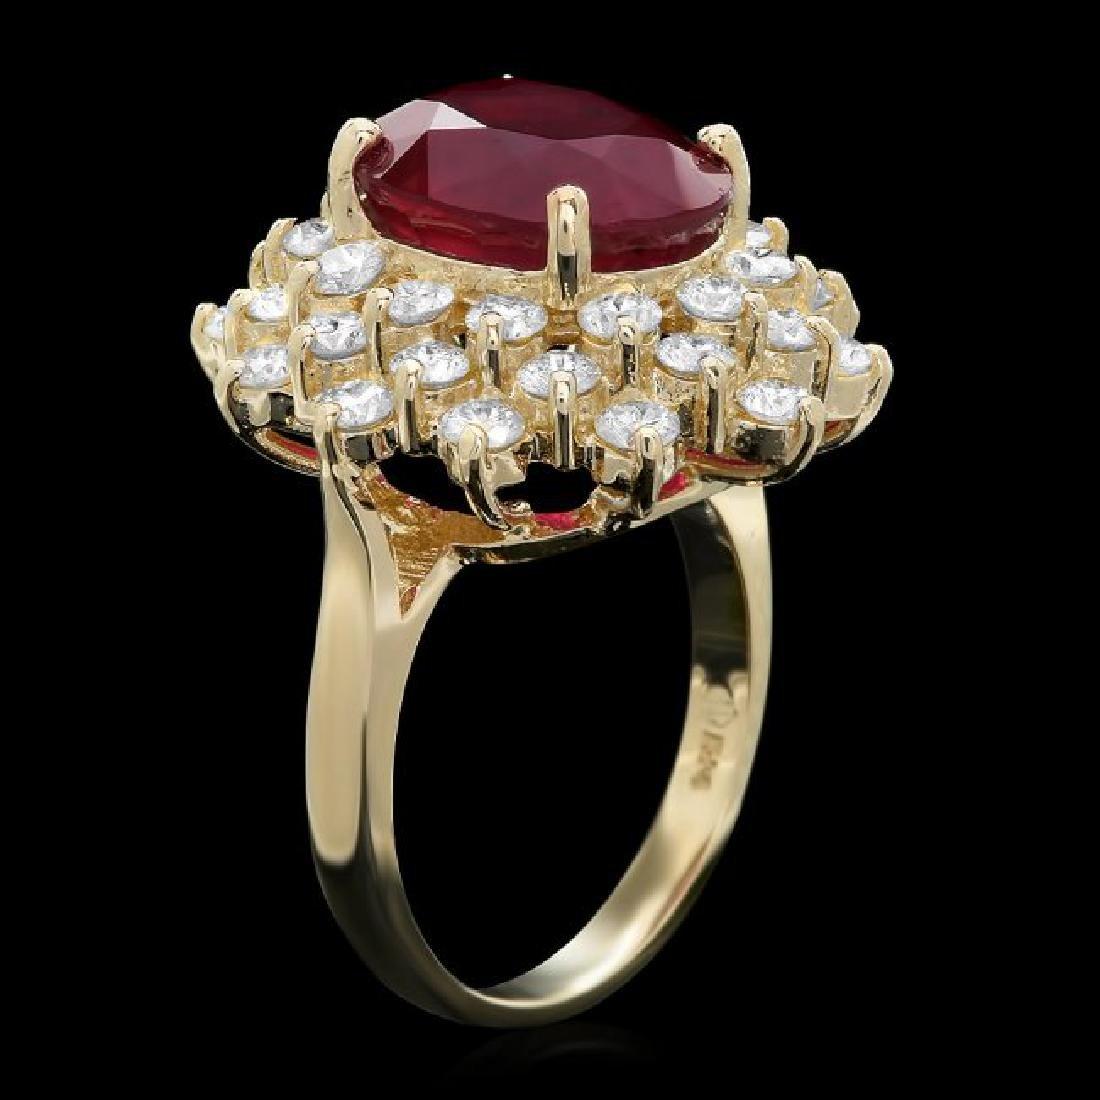 14k Yellow Gold 7.50ct Ruby 2.30ct Diamond Ring - 2